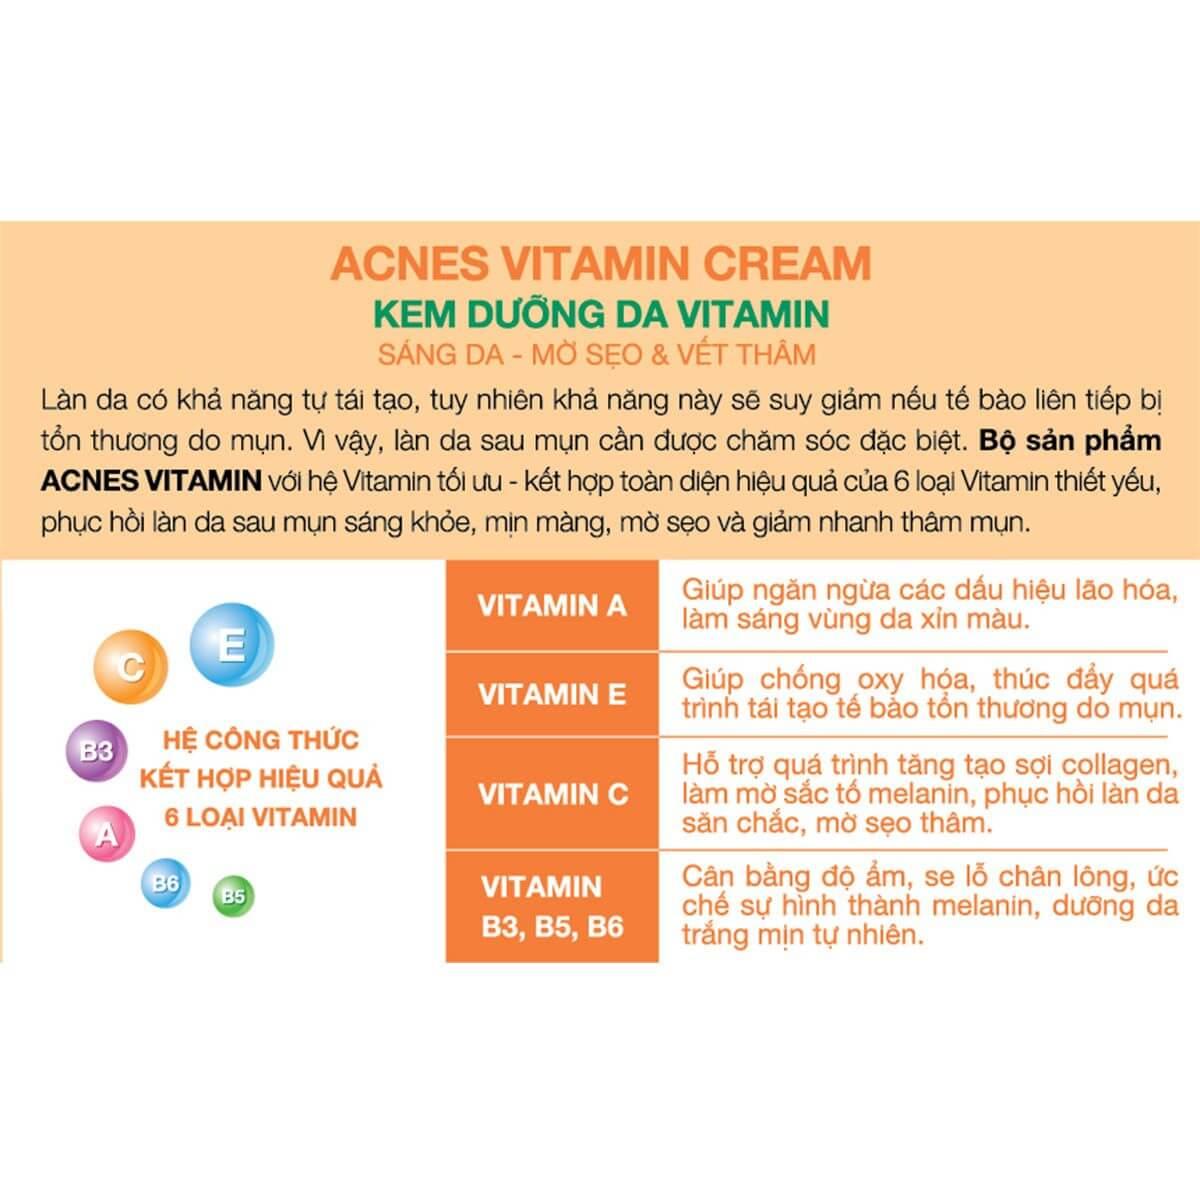 Acnes Vitamin Cream - Kem dưỡng trắng da